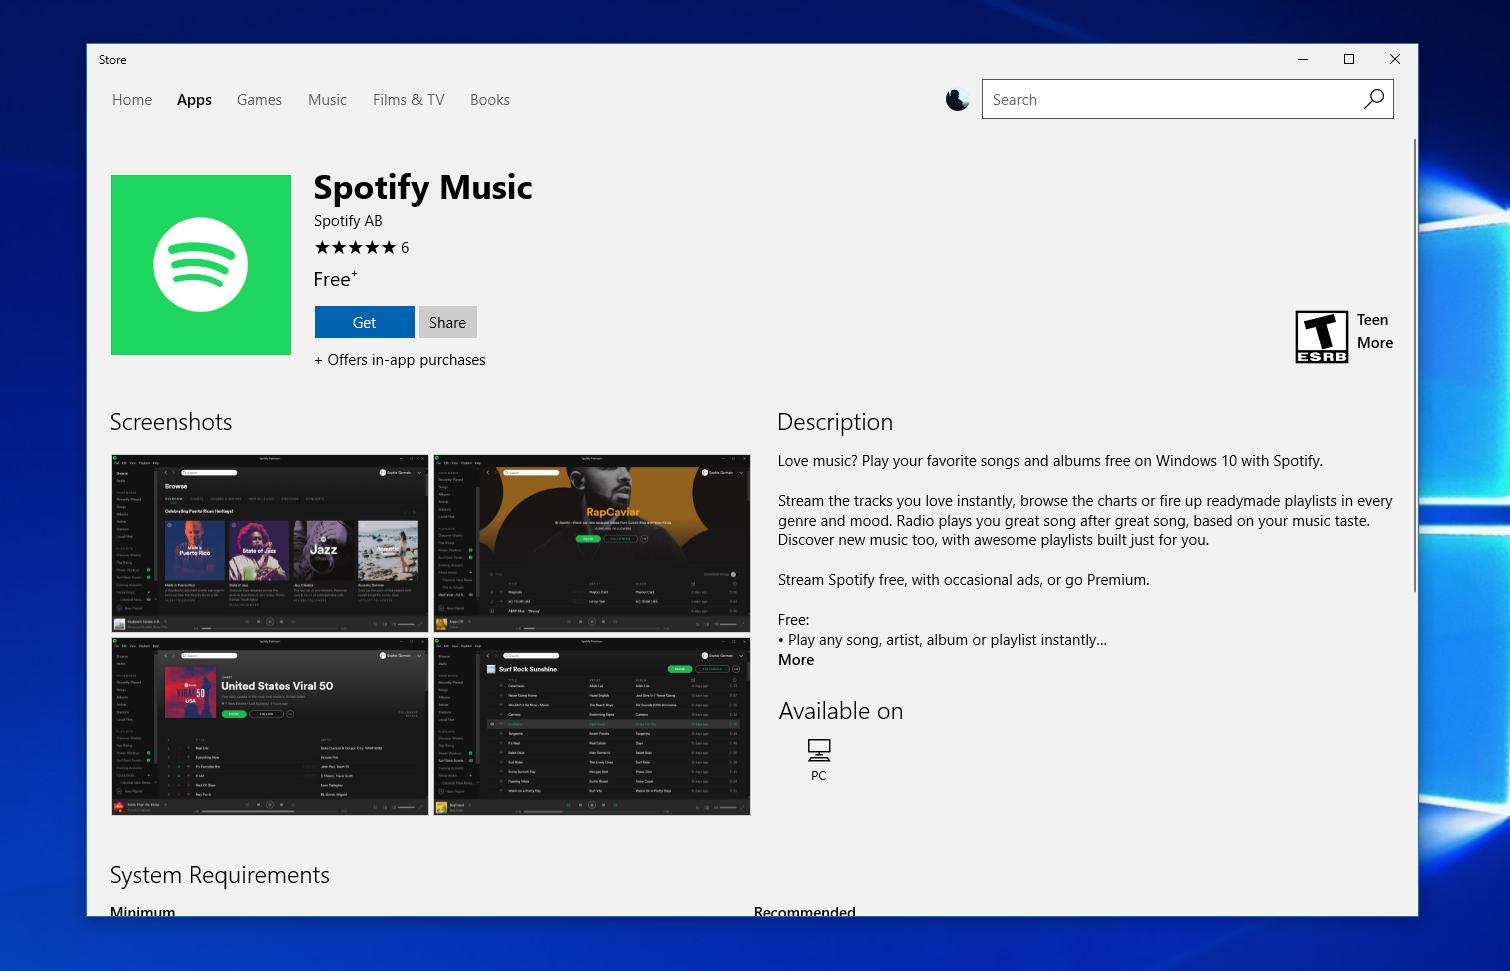 Spotify Mockup Psd in 2020 Mockup psd, Spotify, Mockup